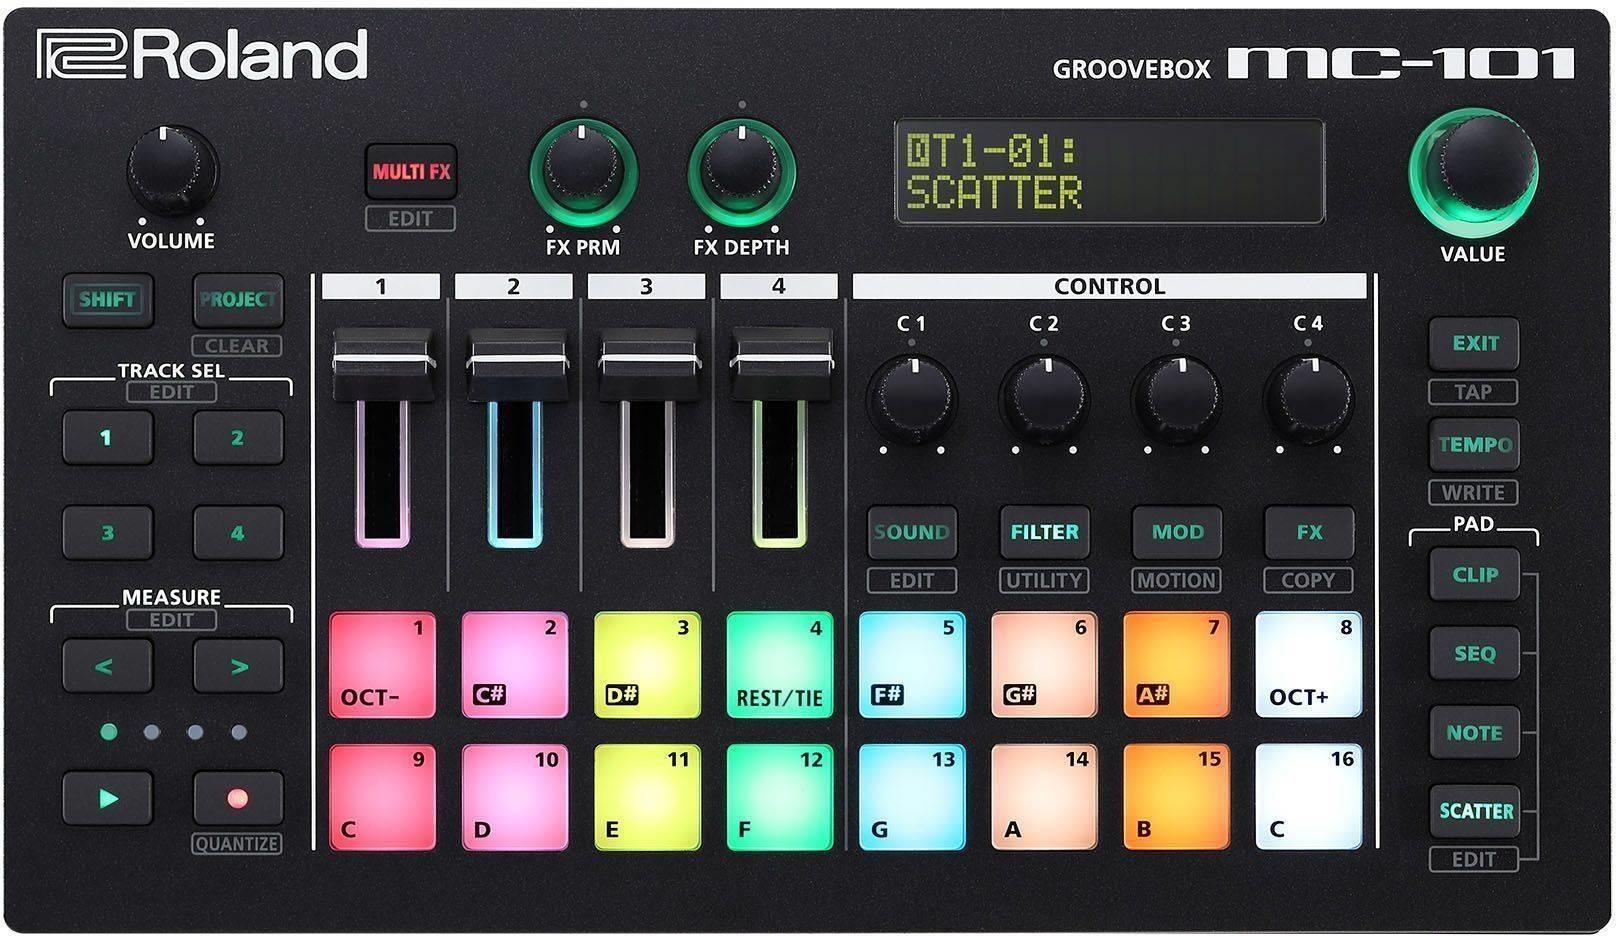 Roland GROOVEBOX MC-101